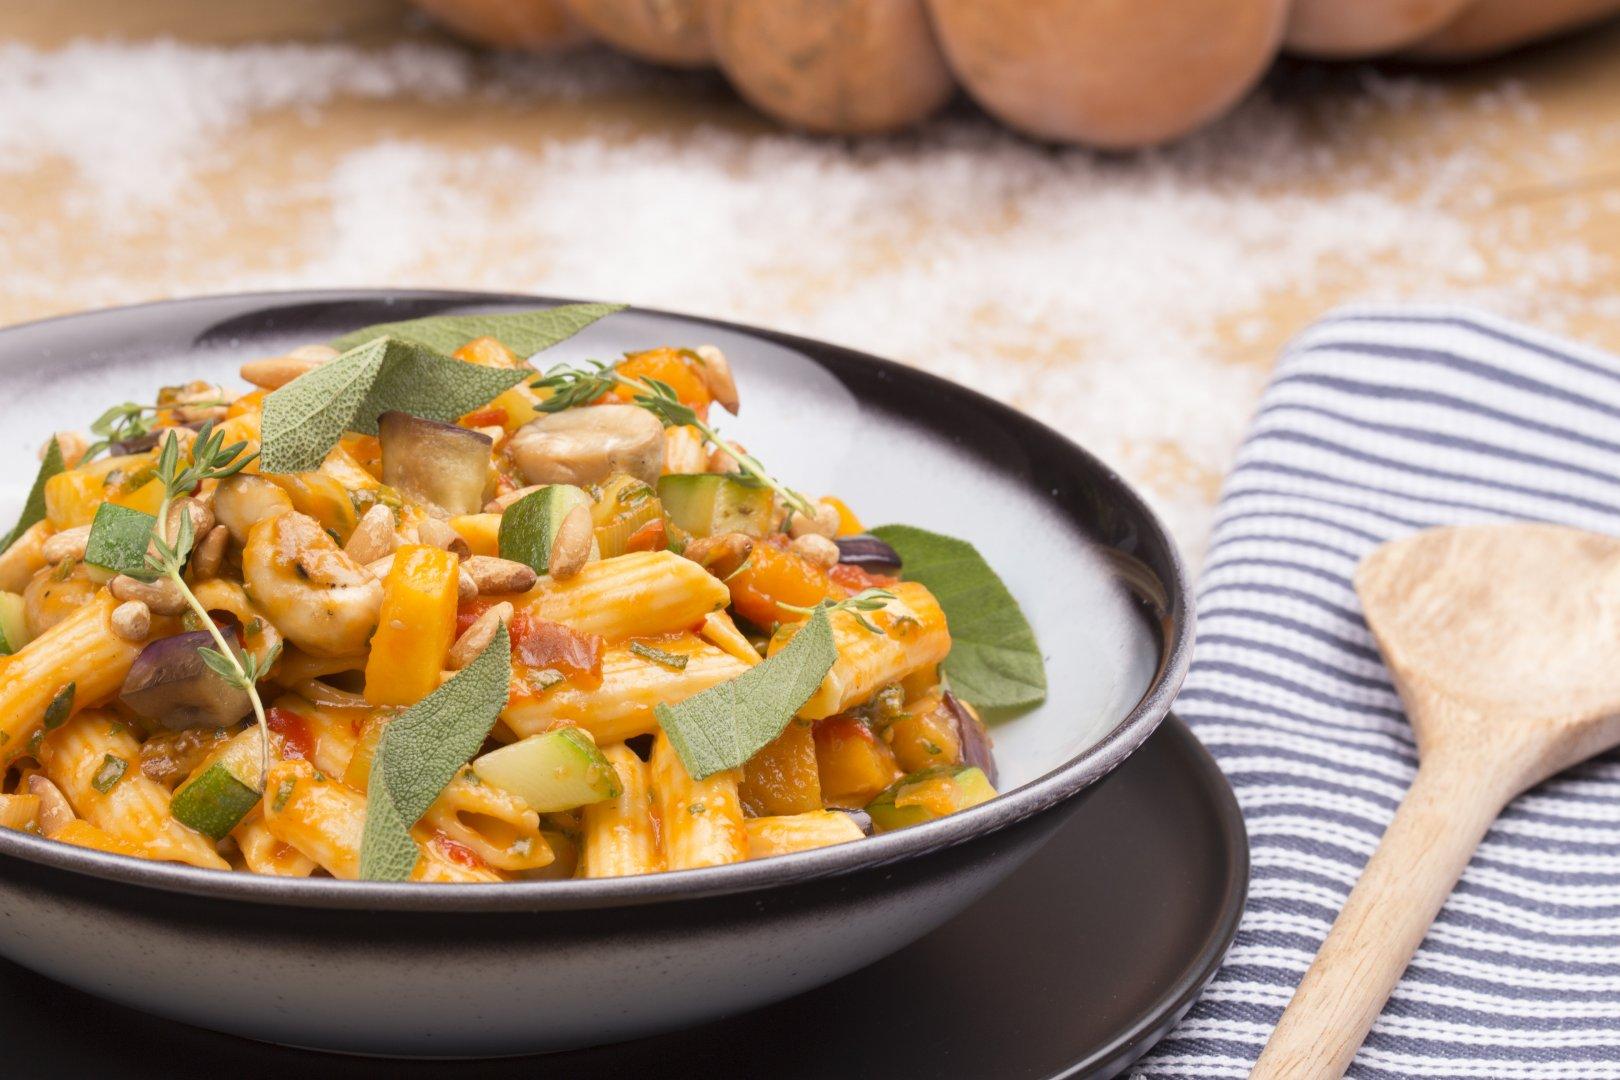 Lauwwarme Mediterraanse salade, geïnspireerd op ratatouille